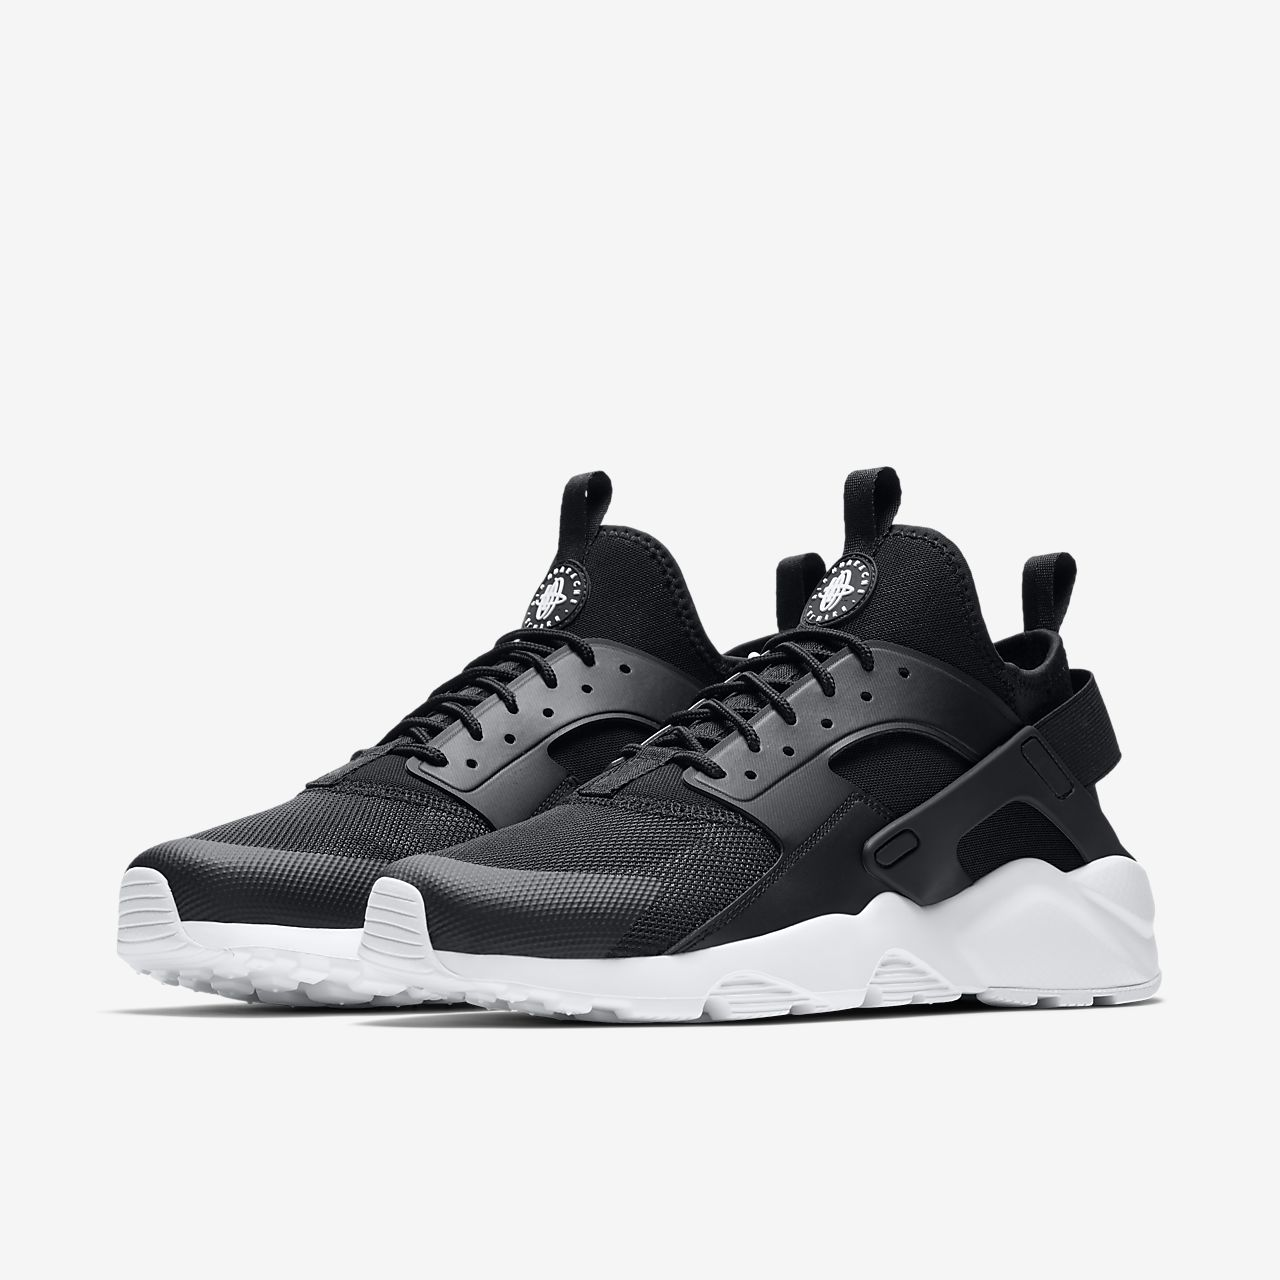 separation shoes 291d3 93452 nike huarache uomo casual